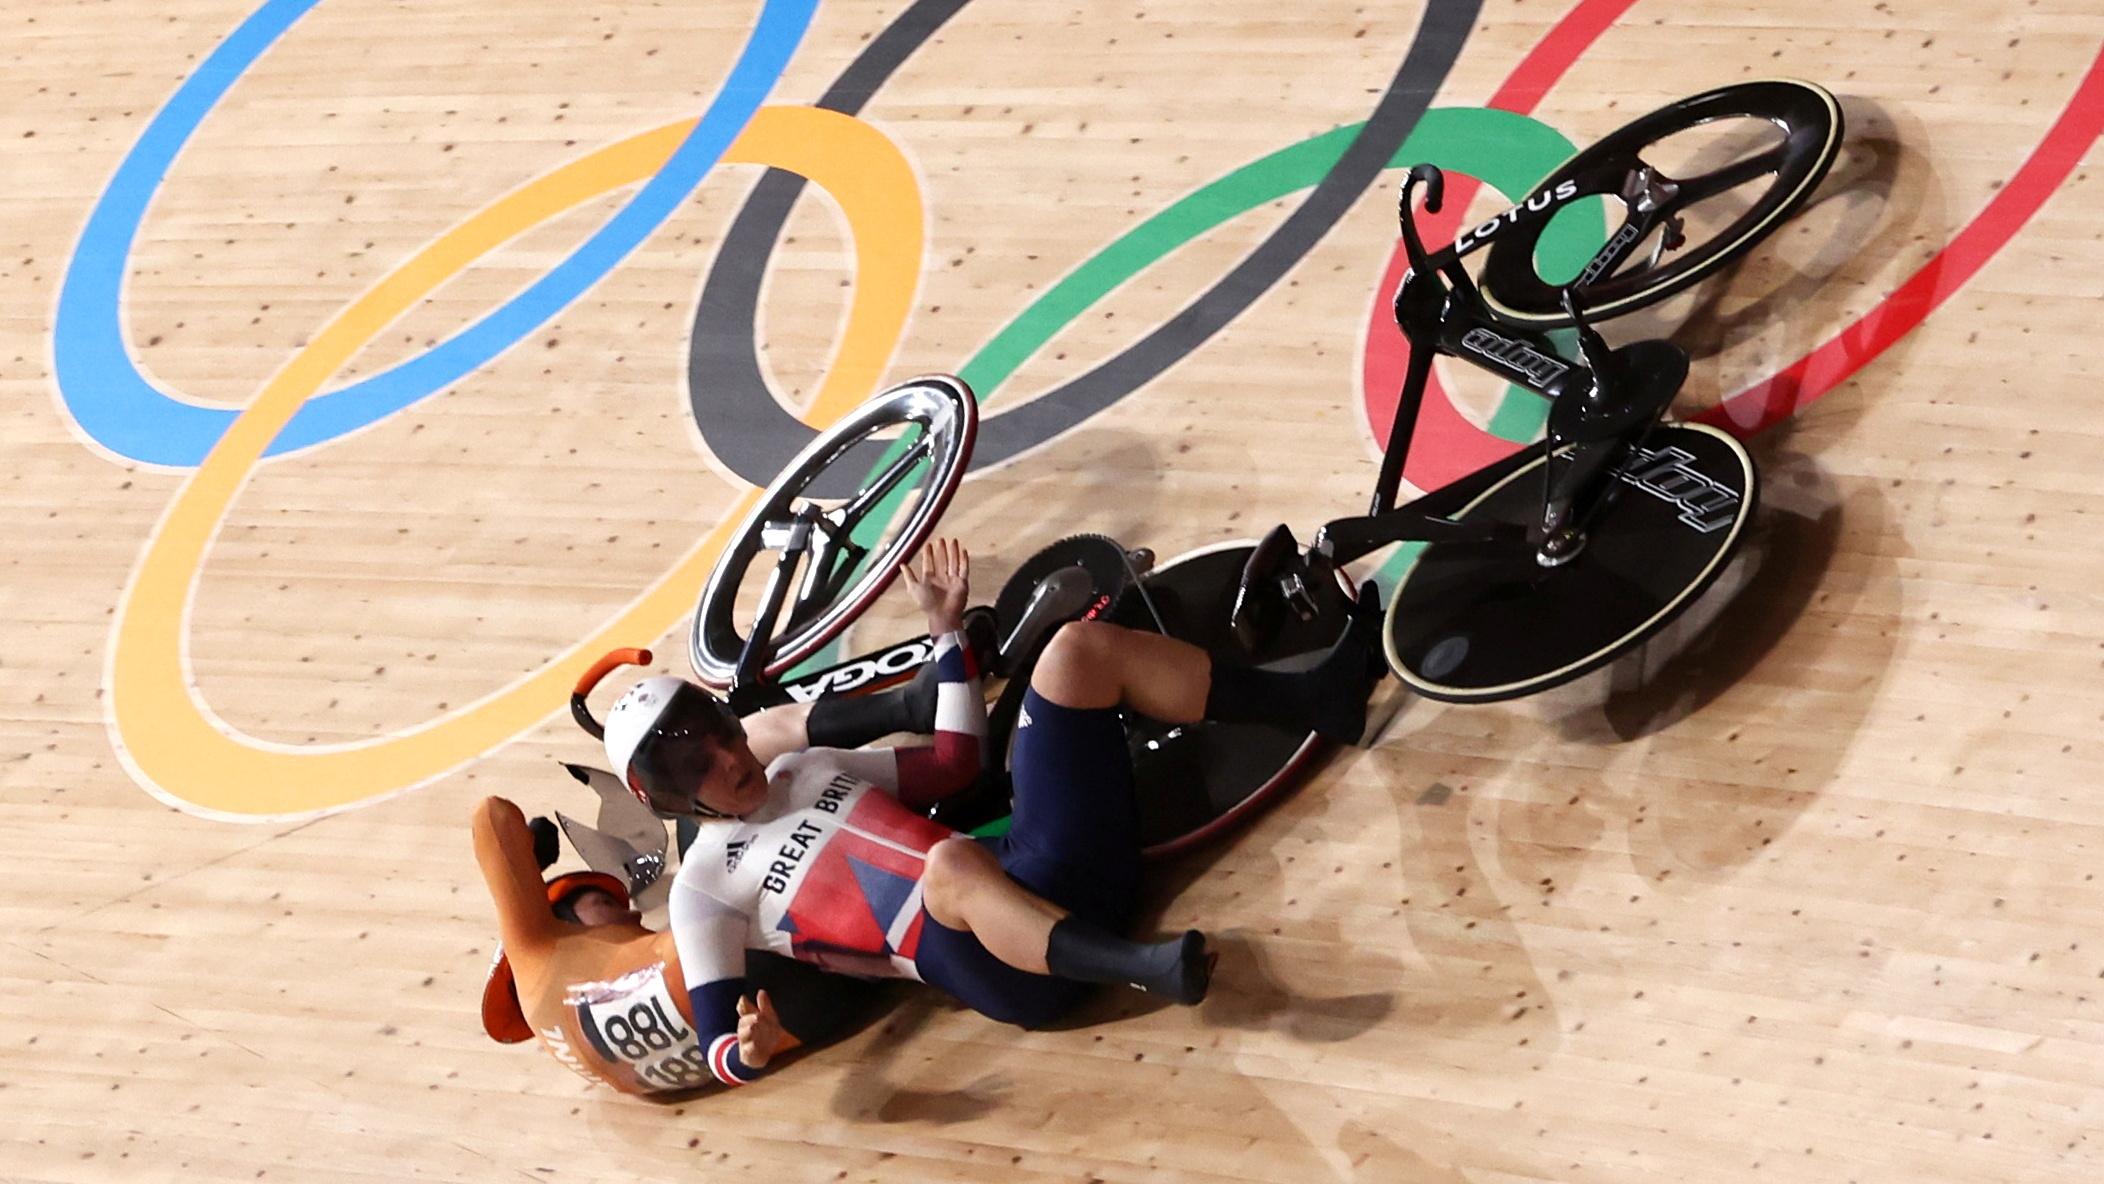 Tokyo 2020 Olympics - Cycling - Track - Women's Keirin - Quarterfinal - Izu Velodrome, Shizuoka, Japan - August 5, 2021.  Laurine van Riessen of the Netherlands and Katy Marchant of Britain crash. REUTERS/Christian Hartmann